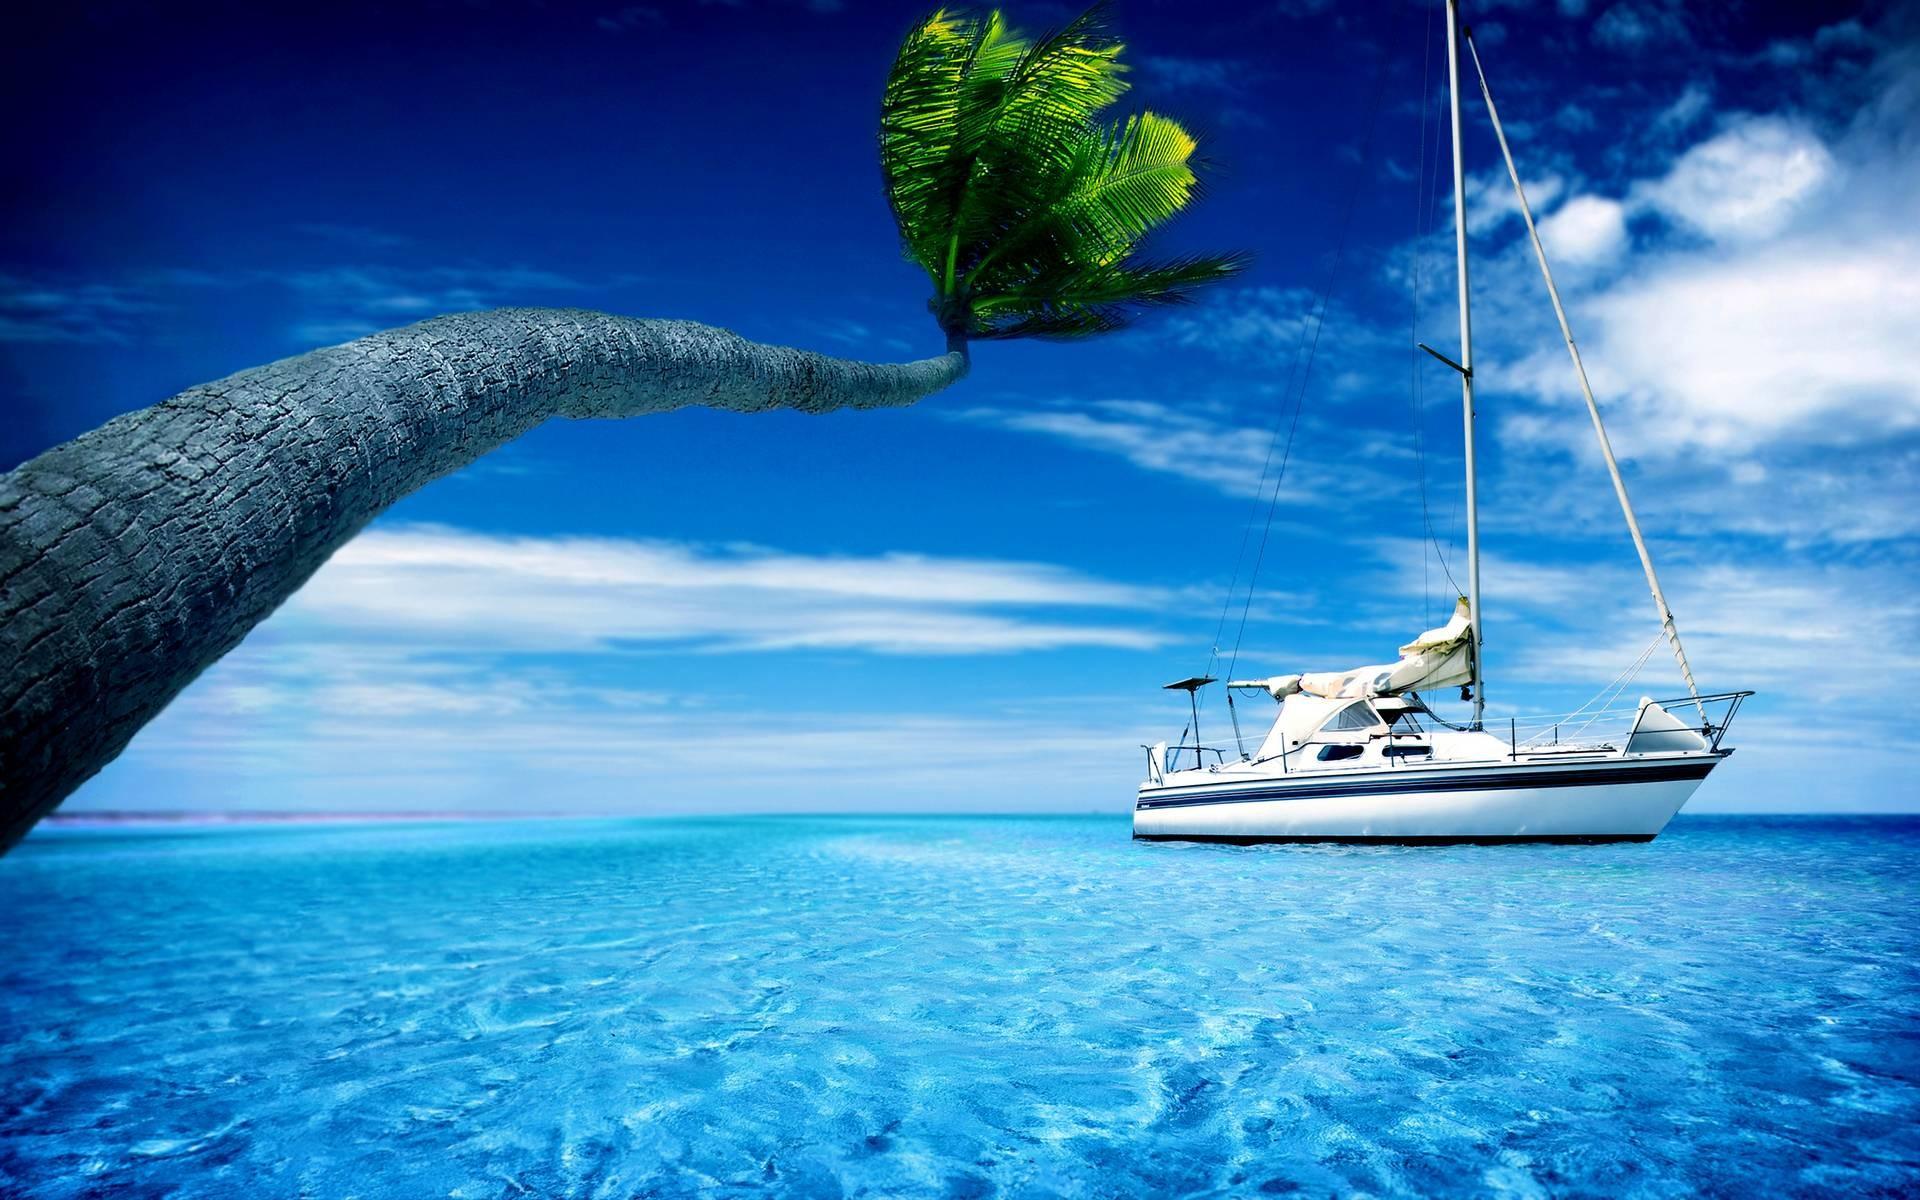 Summer Screensavers Free : Summer Wallpaper Yachts Sky Trees Boat .